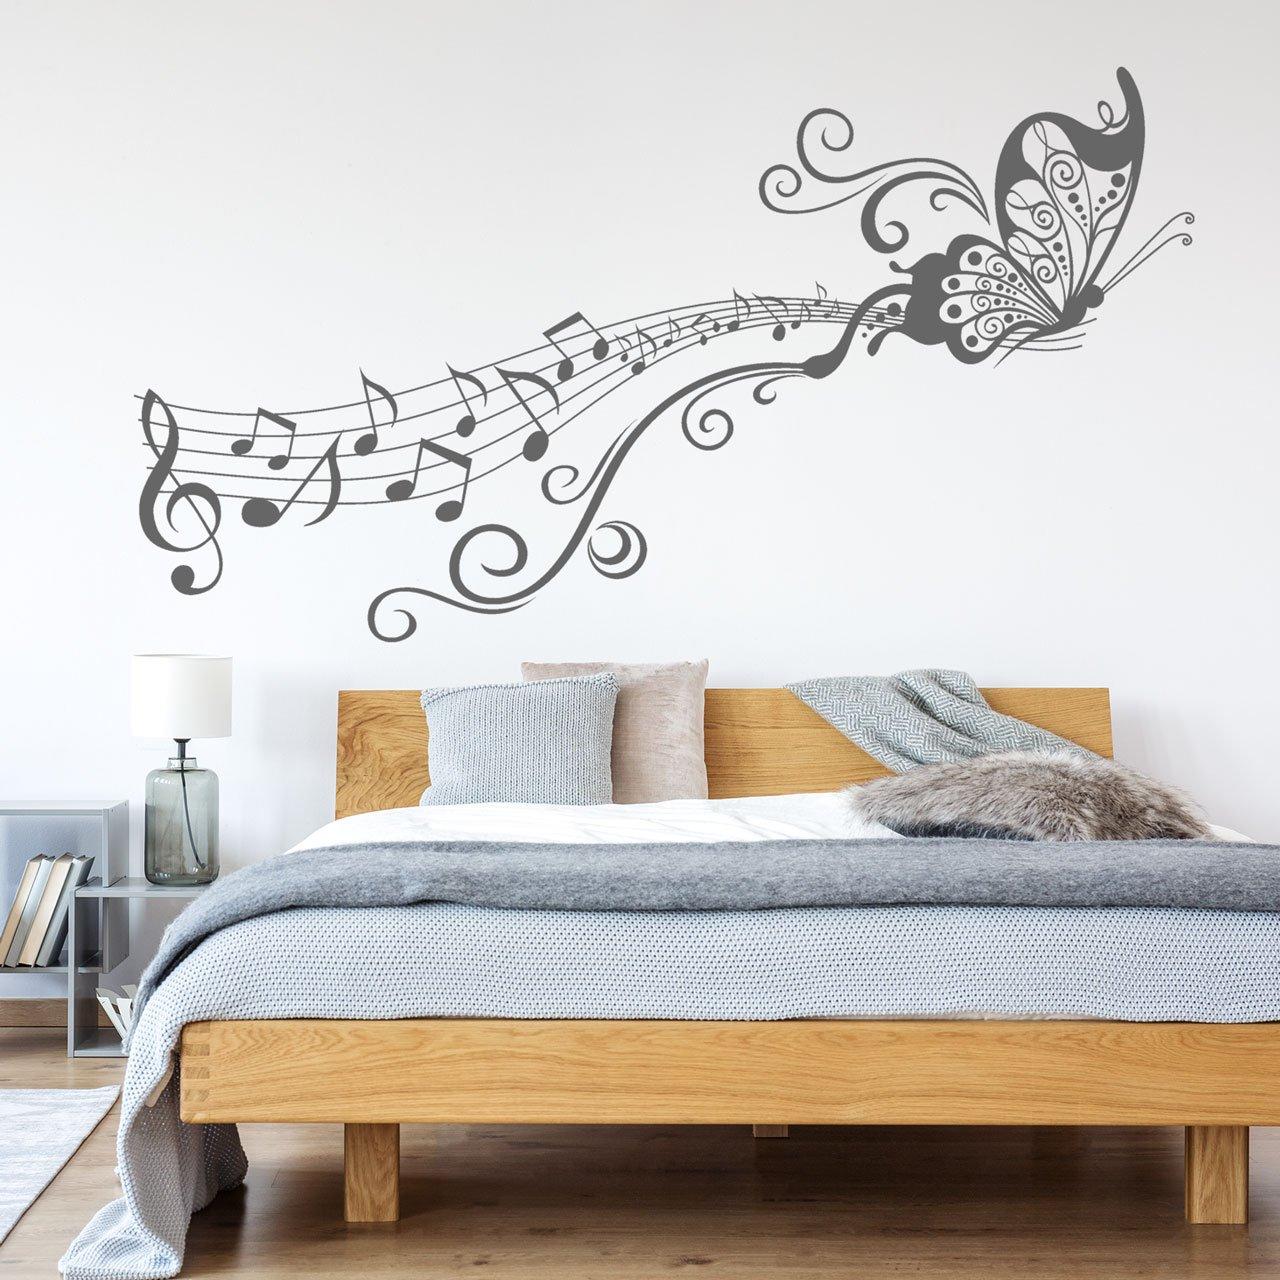 DESIGNSCAPE® Wandtattoo Schmetterling Schmetterling Schmetterling auf Notenlinie   Wandtattoo für Musikfans 120 x 65 cm (Breite x Höhe) weiss DW805111-M-F5 B07CHLKVT9 Wandtattoos & Wandbilder 3cab96